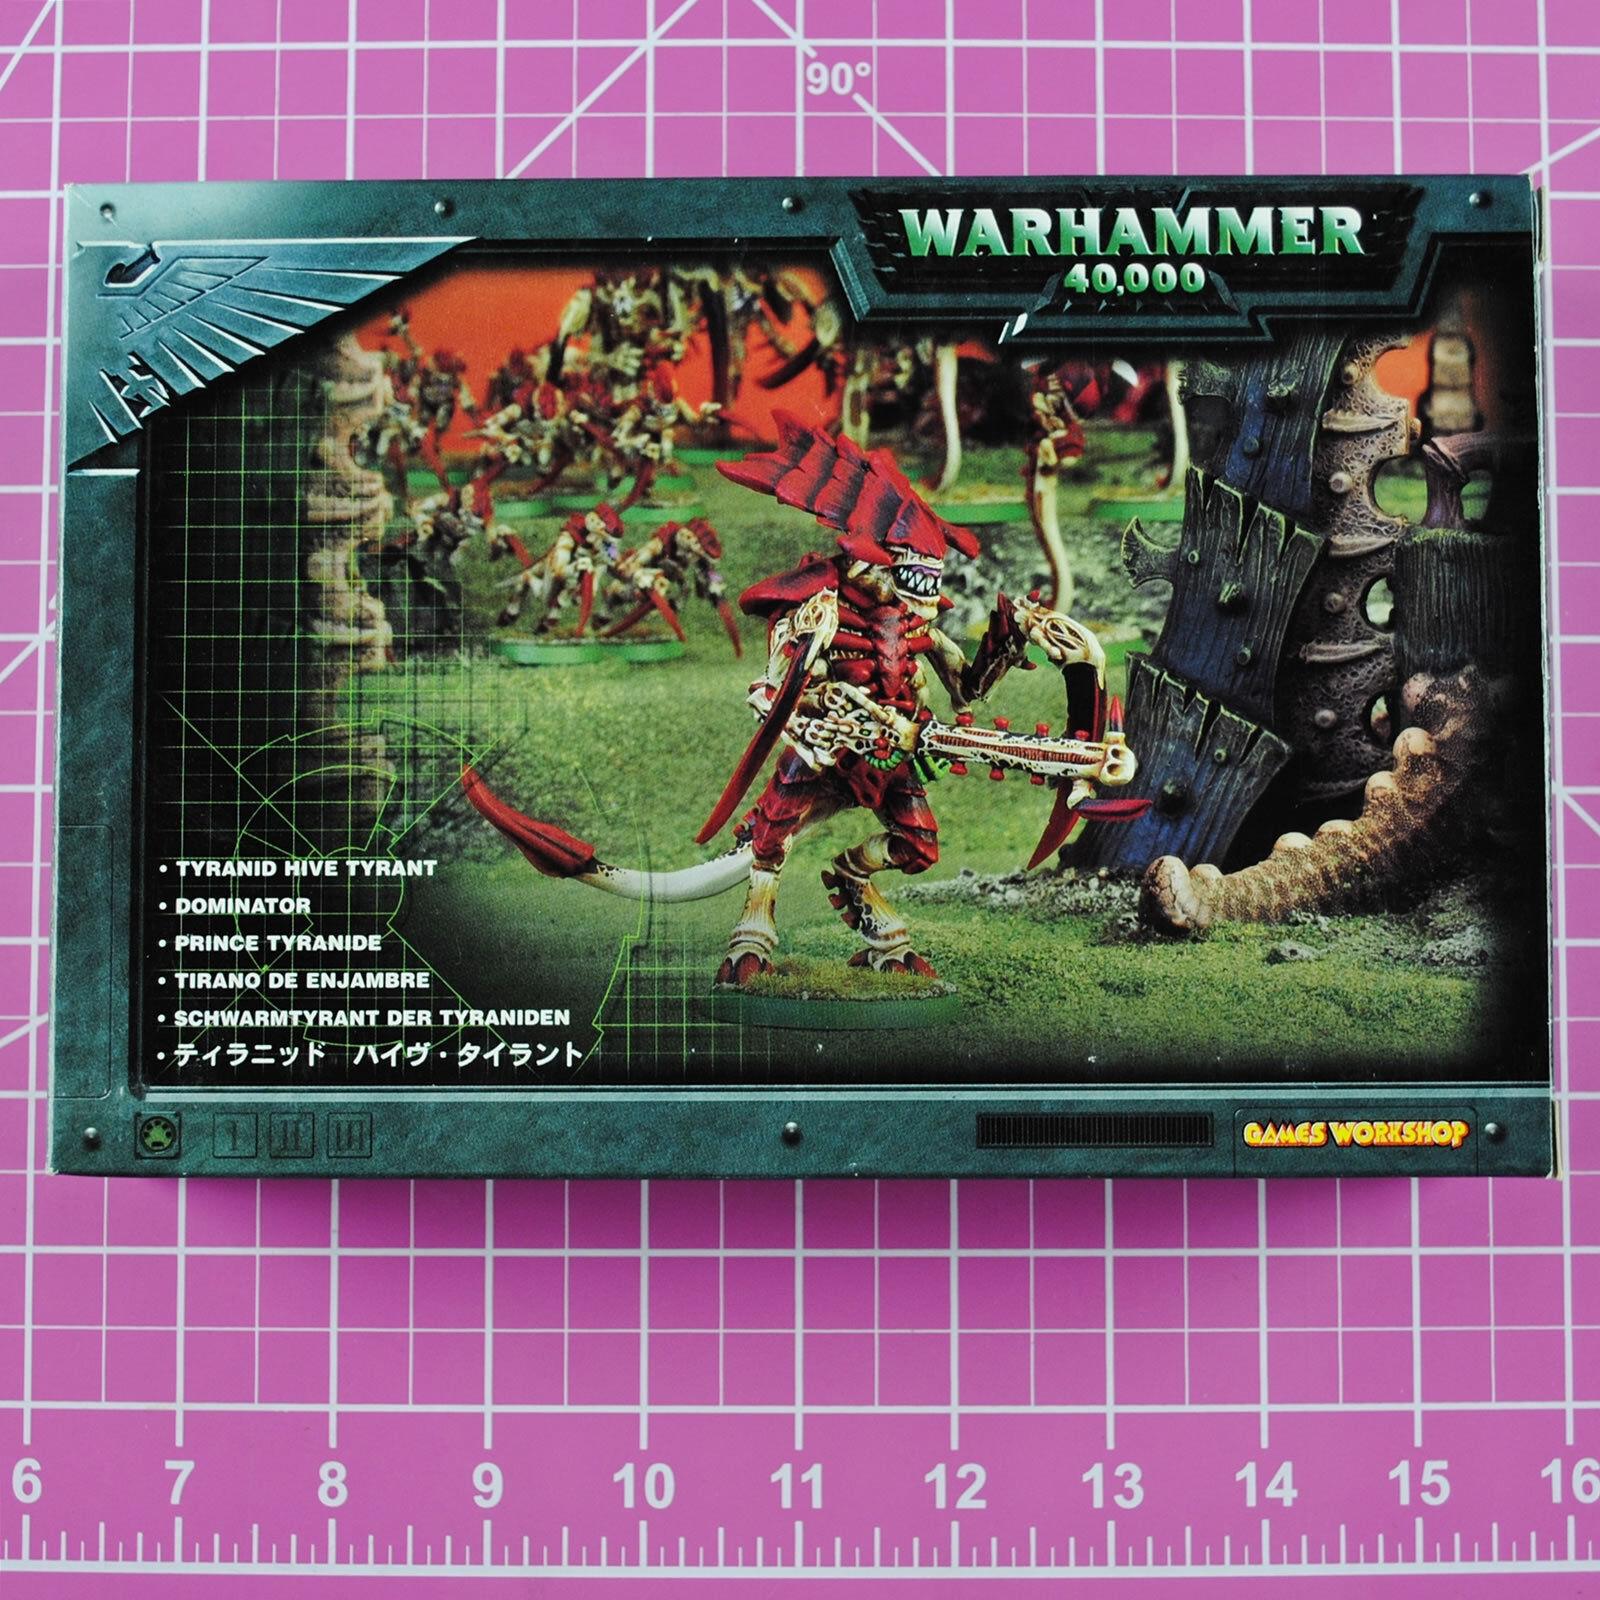 Warhammer 40K Tyranid Hive Tyrant (Metal & Plastic Version) OOP Citadel Tyranids